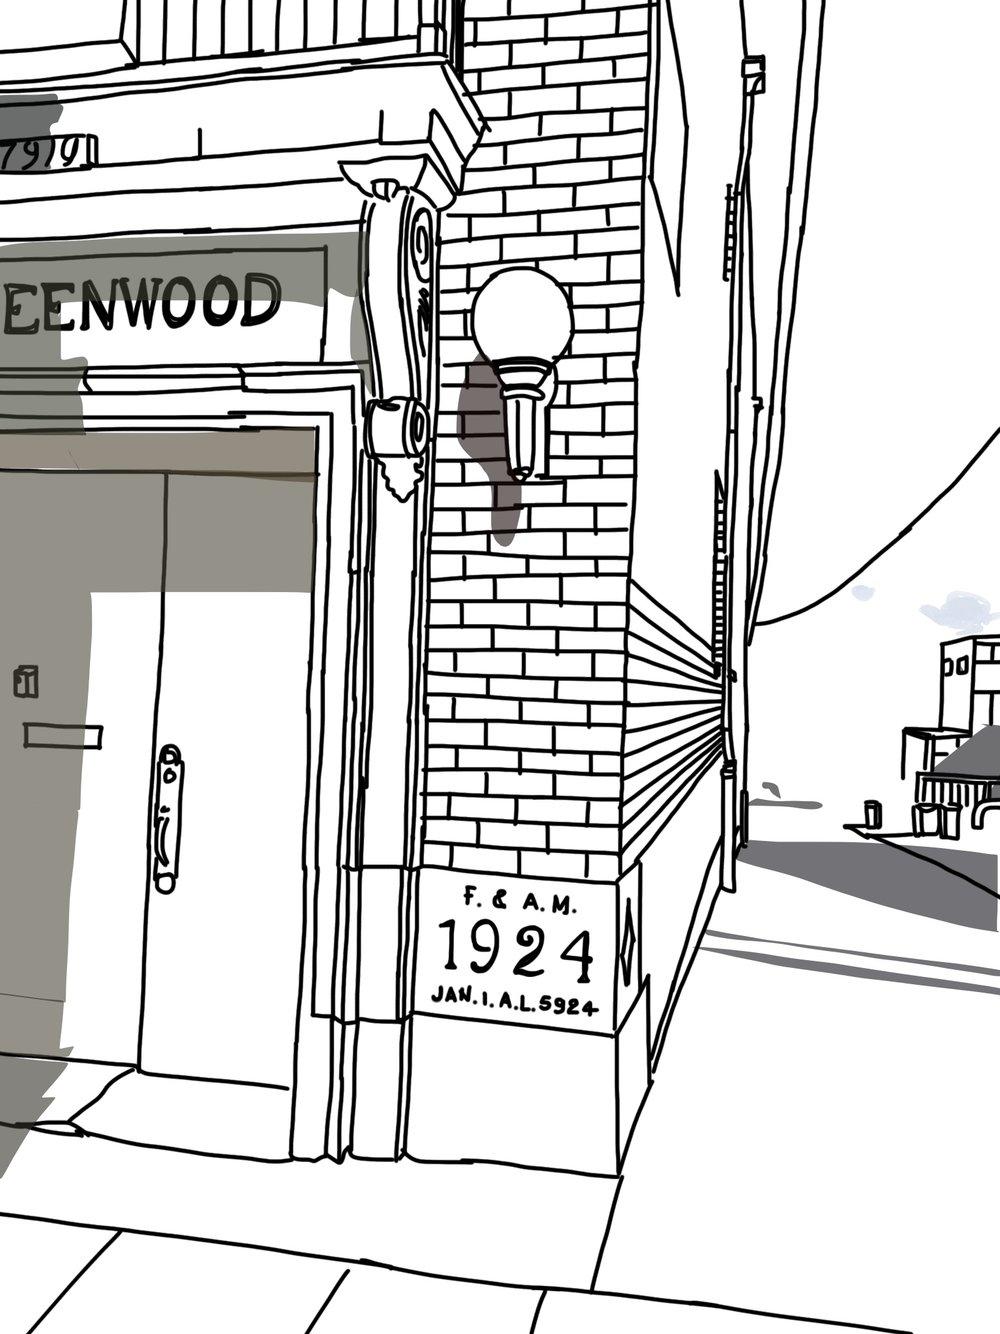 GreenwoodCorner.JPG